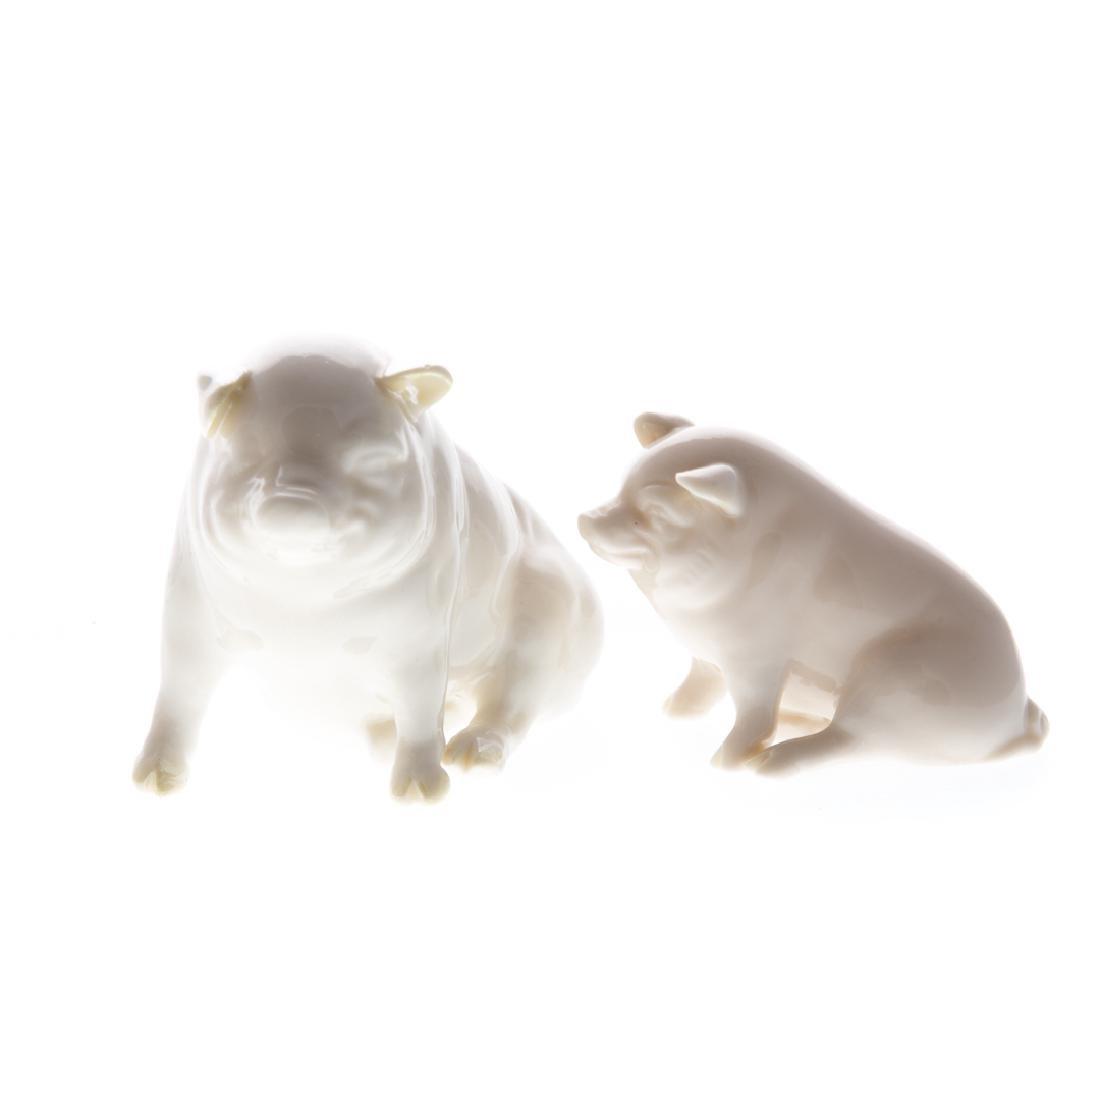 Six English and continental ceramic animals - 2